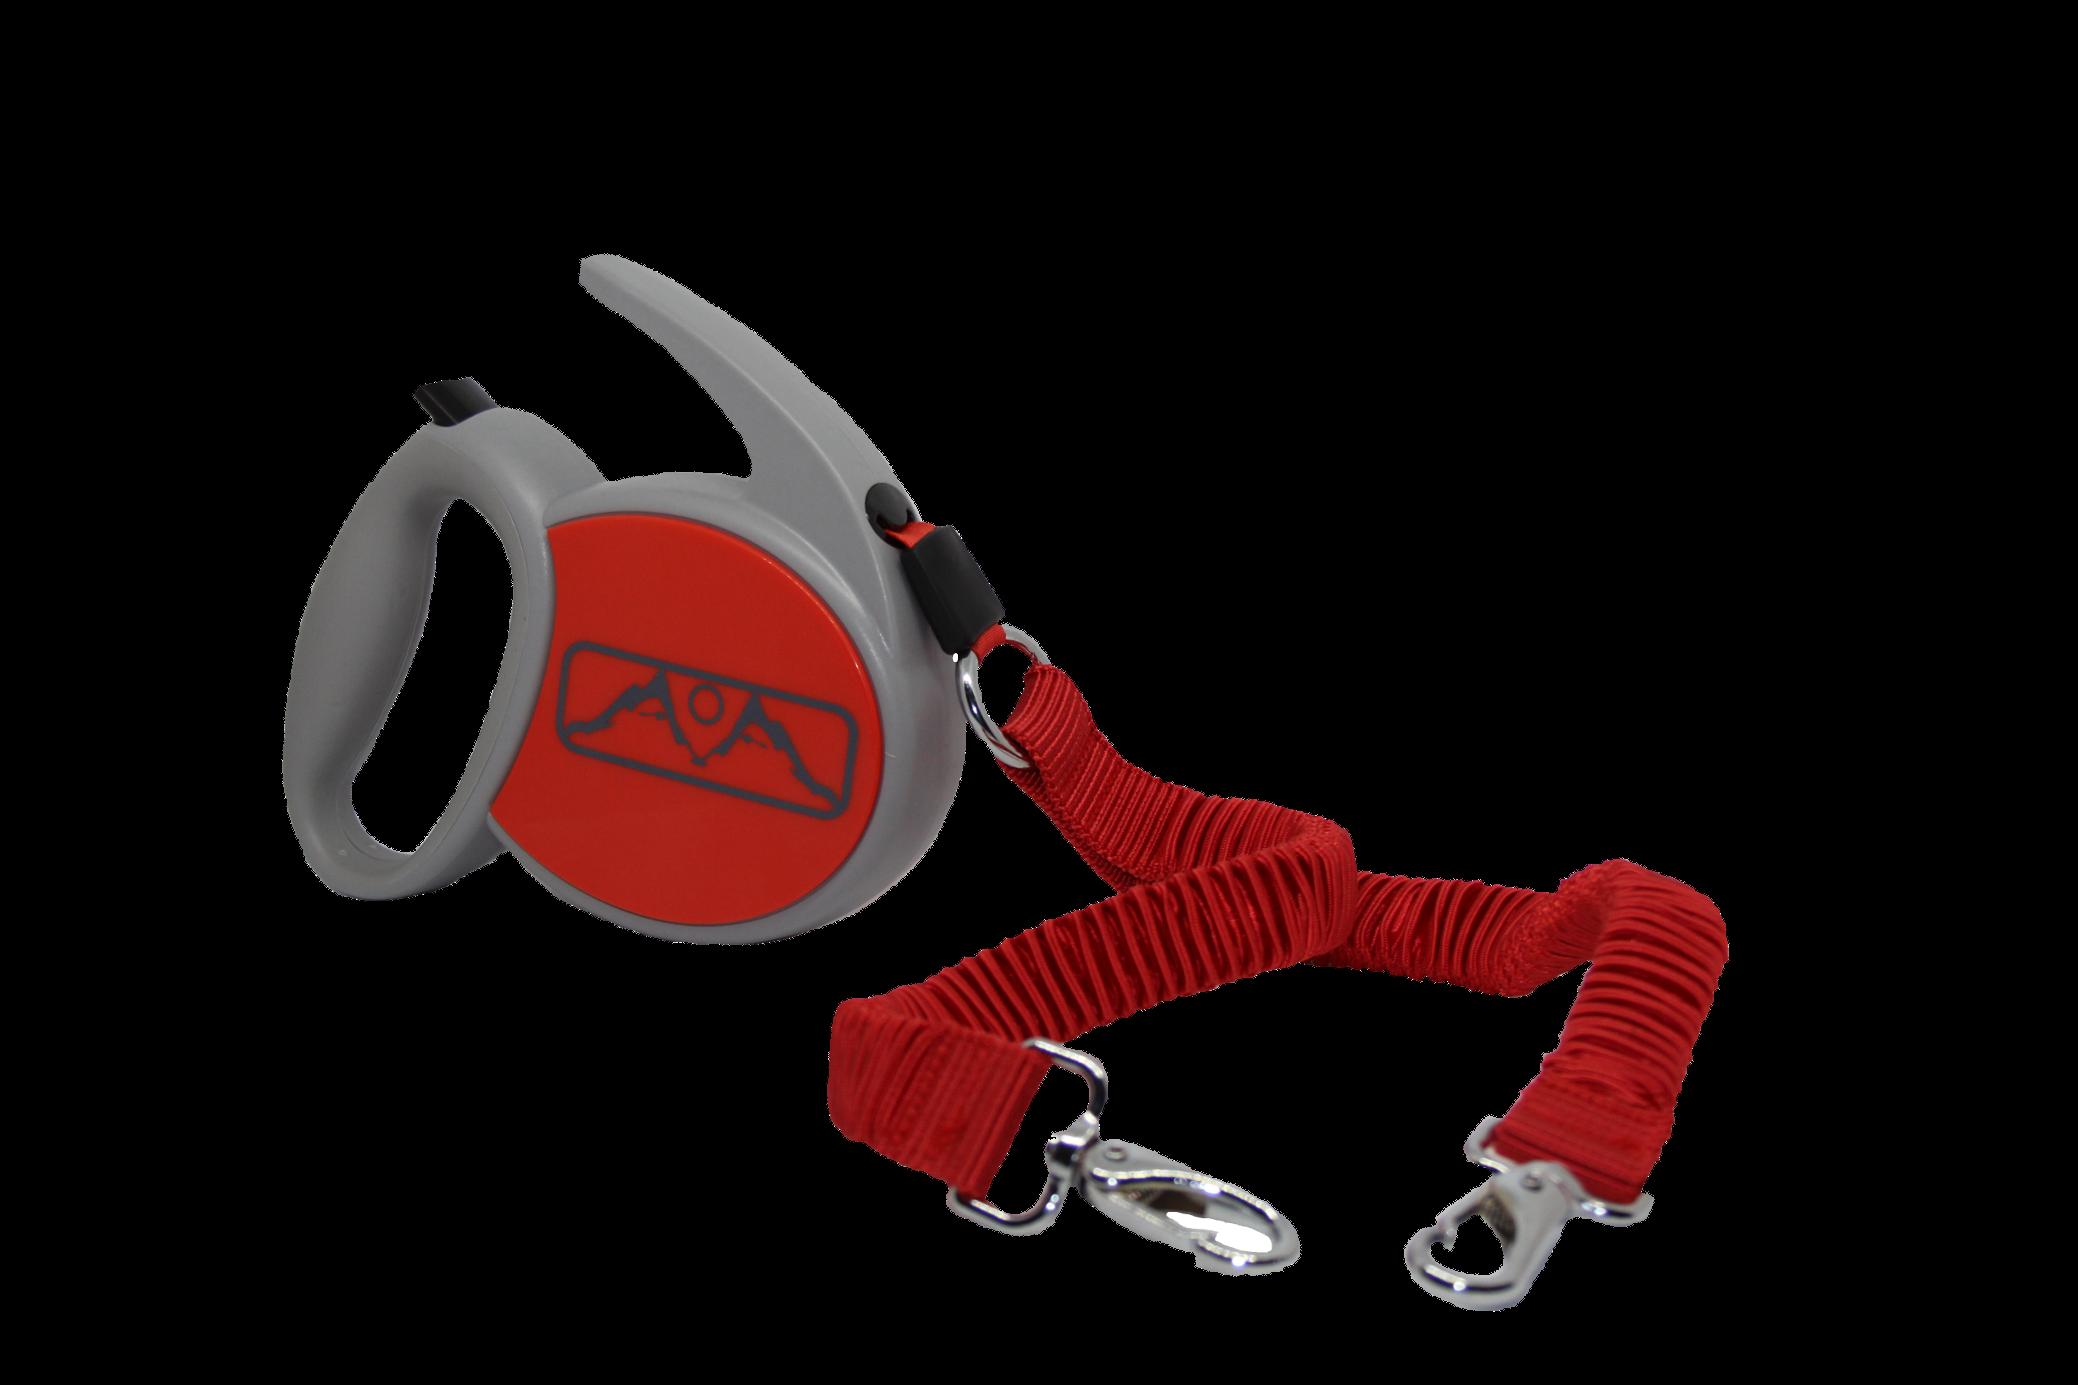 leach-red